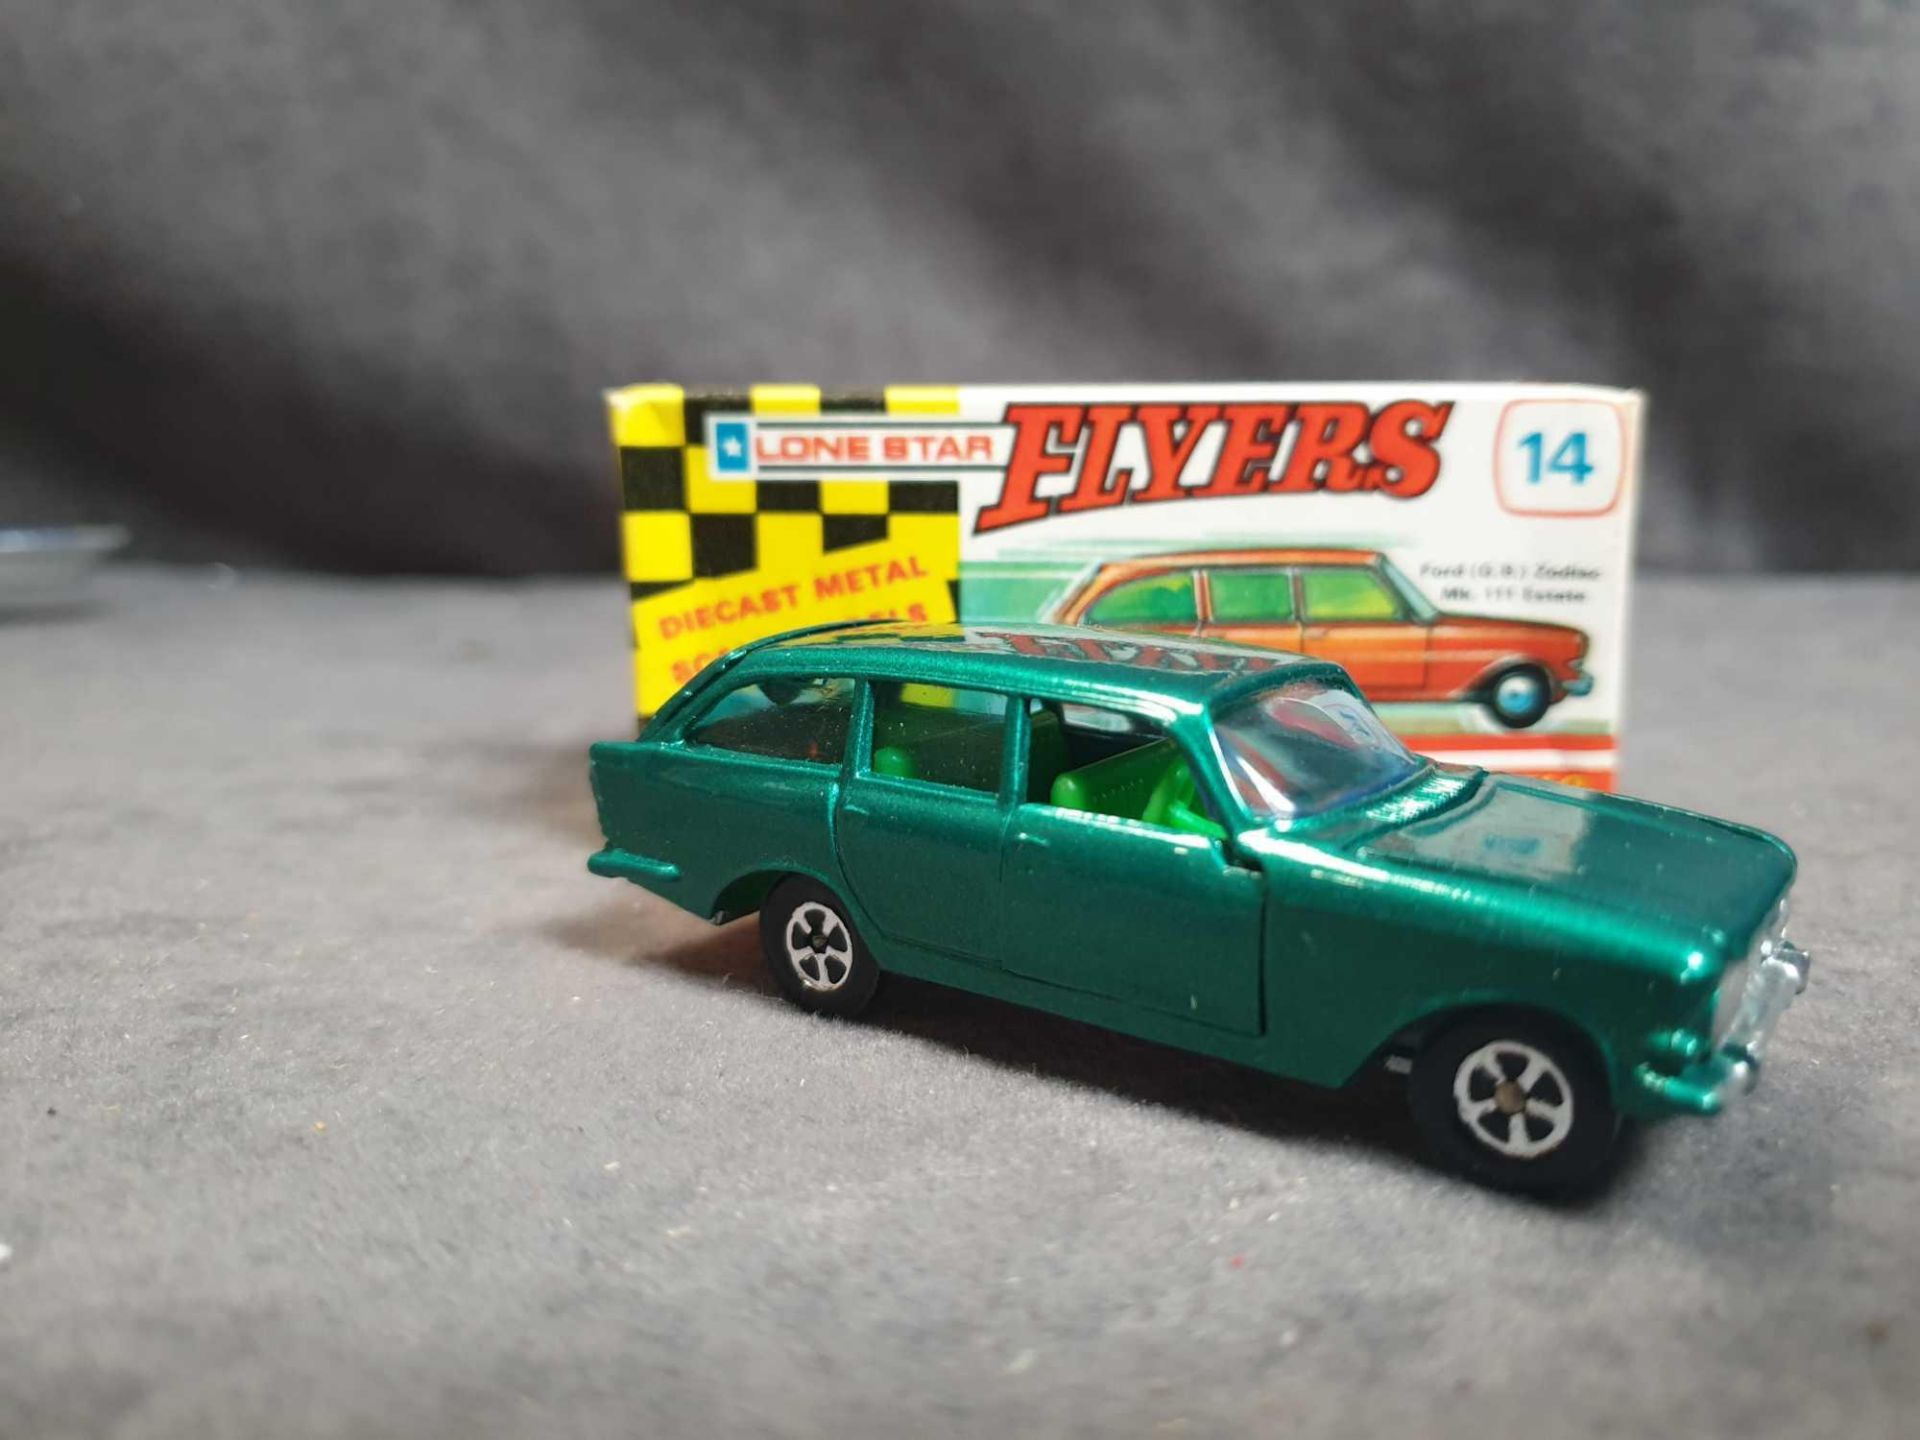 Lot 1346 - Mint Lone Star #111 Road Masters Flyers 14 Super Cars Ford Zodiak Estate Green Rare Green Windows